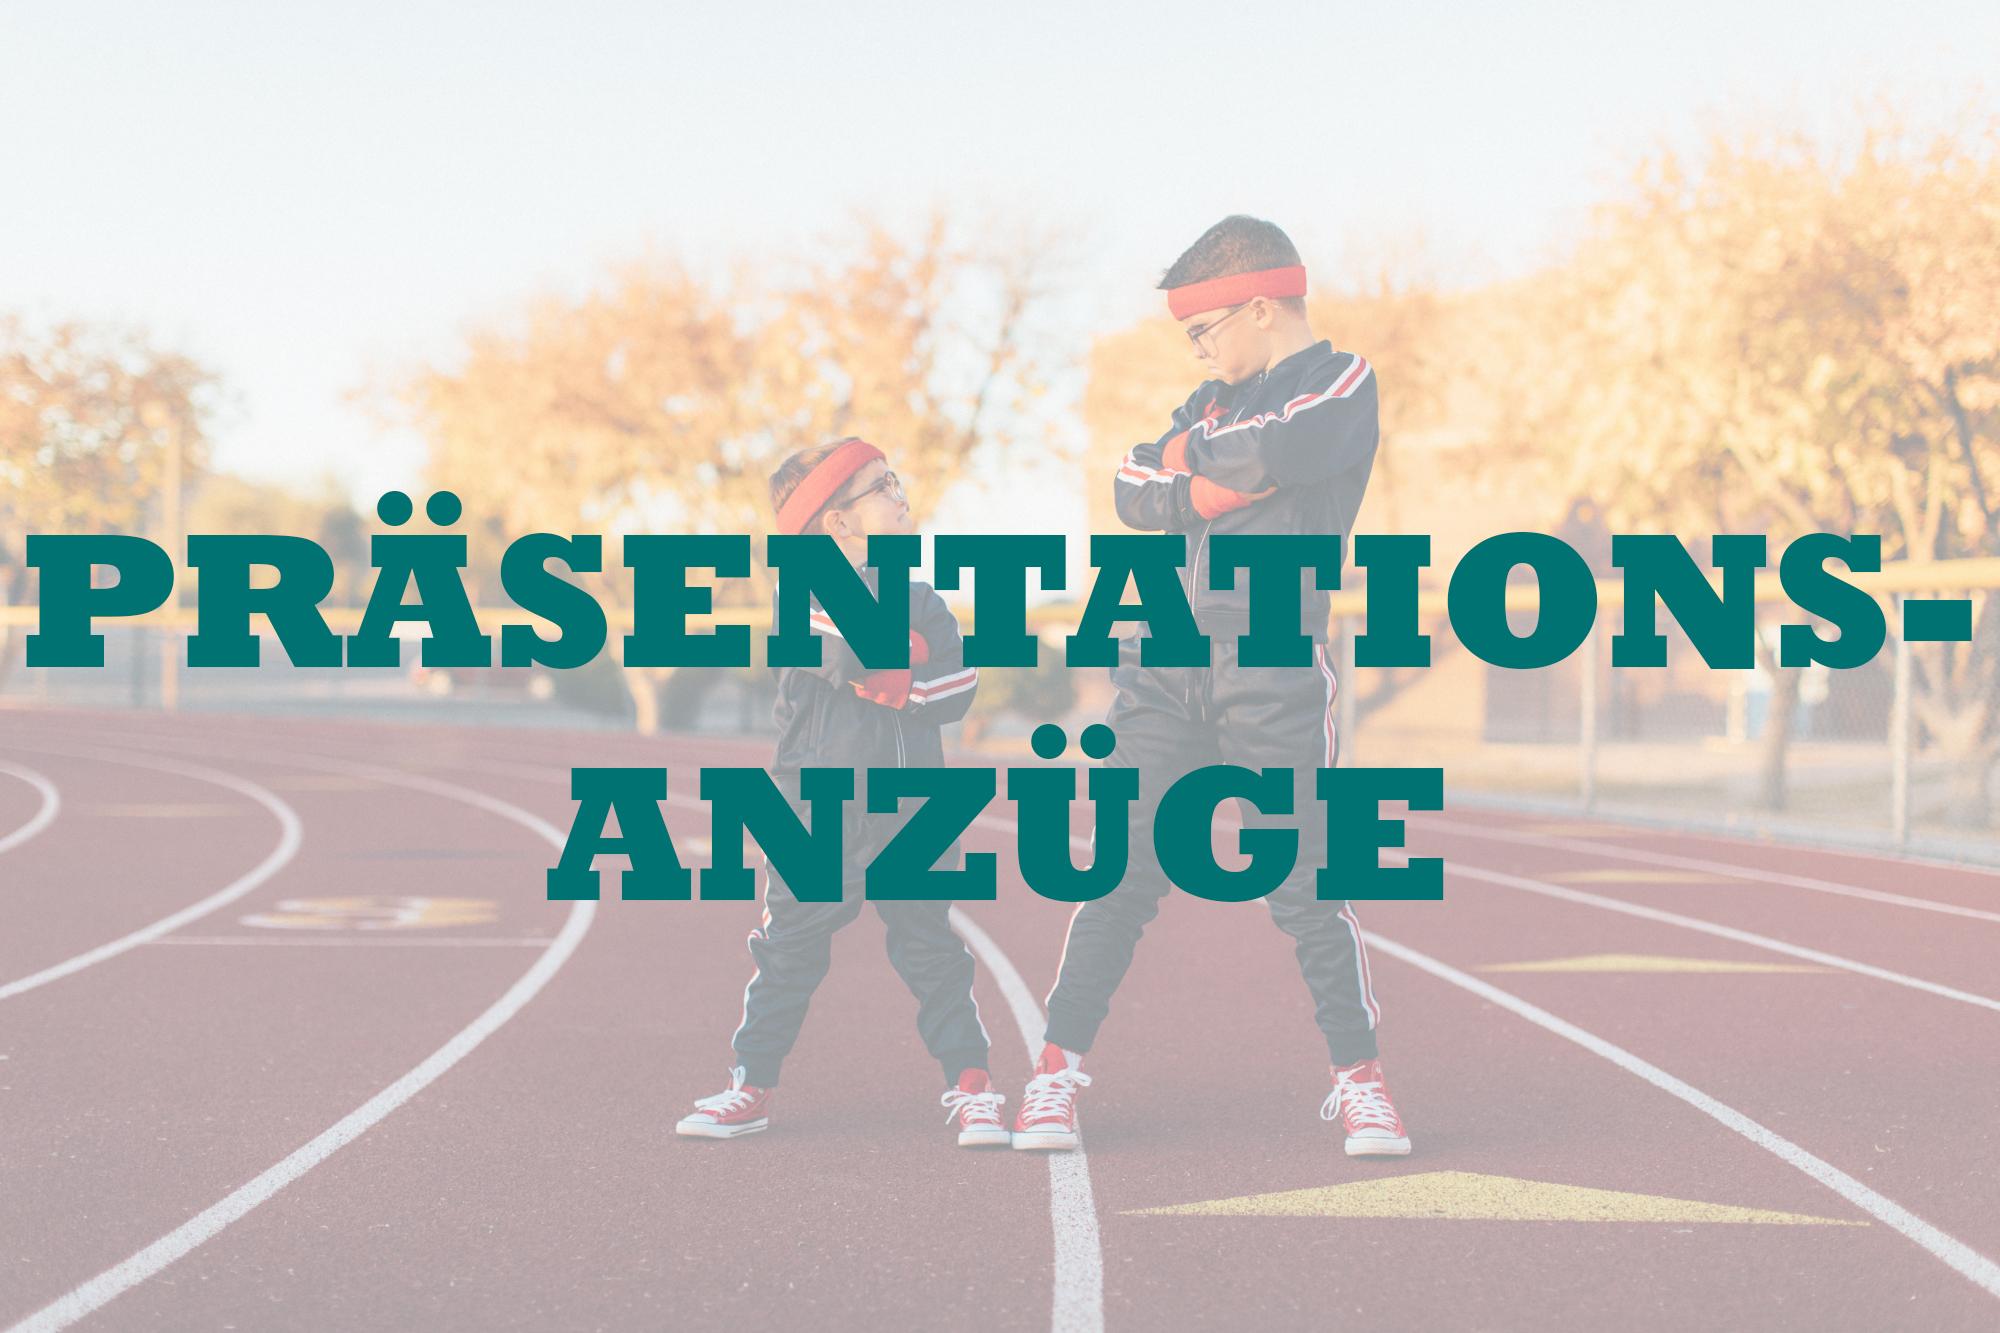 PRÄSENTATIONSANZUG_Weyhe_WERBUNG_2